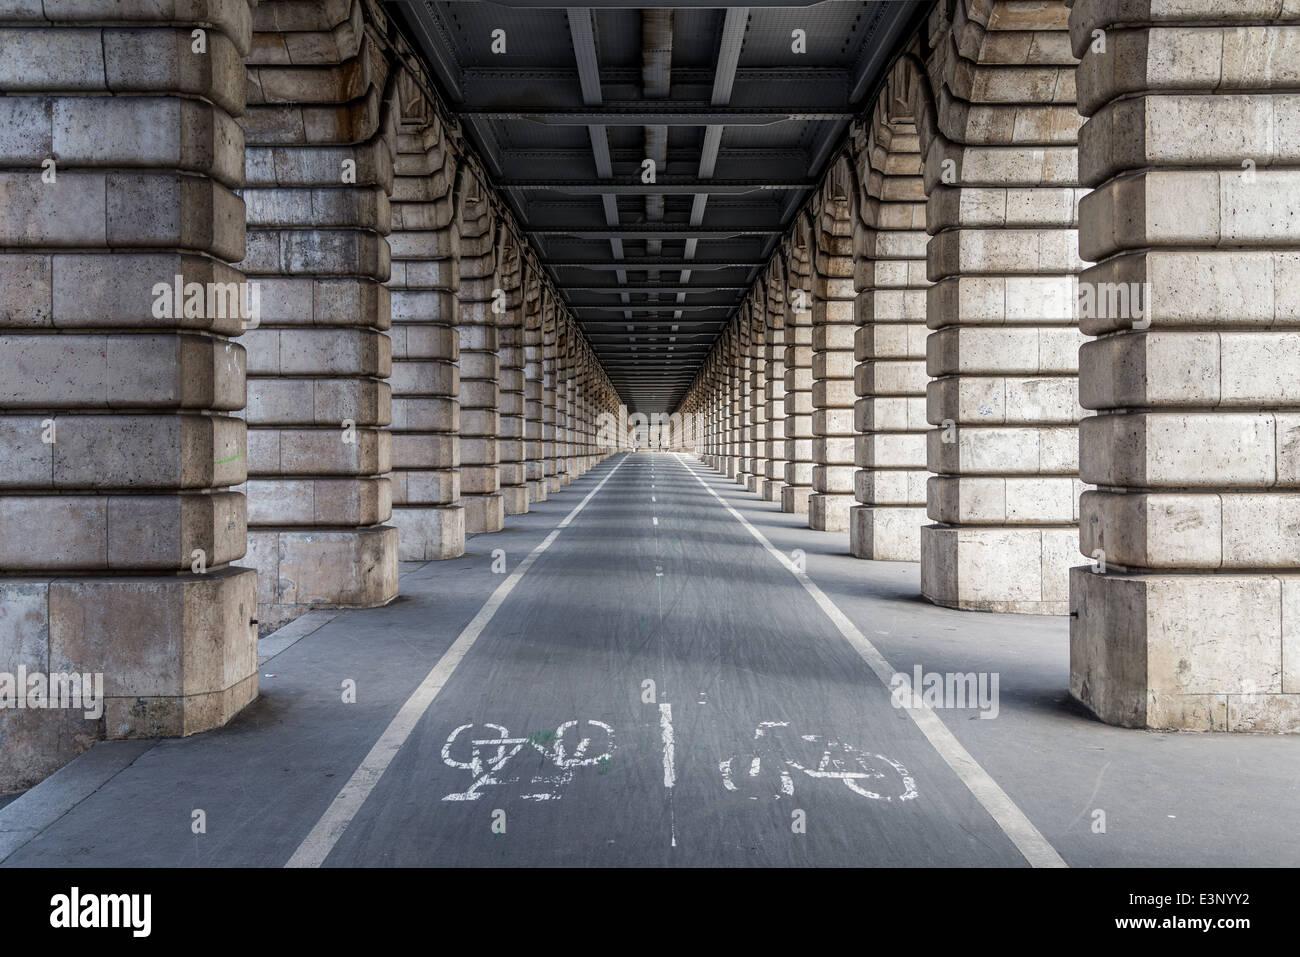 The empty bike lanes of the Bercy Bridge,Paris France. - Stock Image